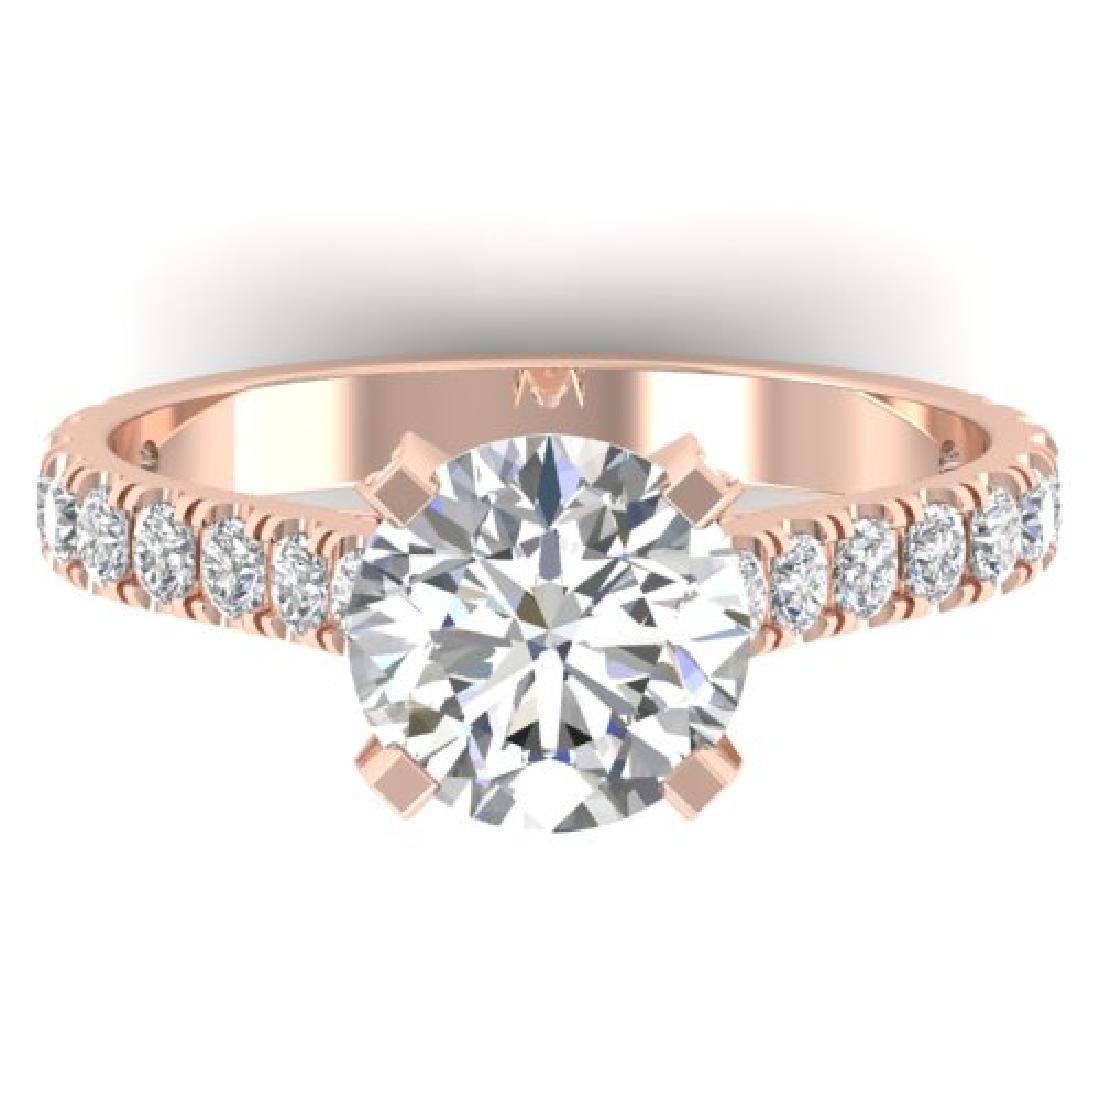 2.4 CTW Certified VS/SI Diamond Solitaire Art Deco Ring